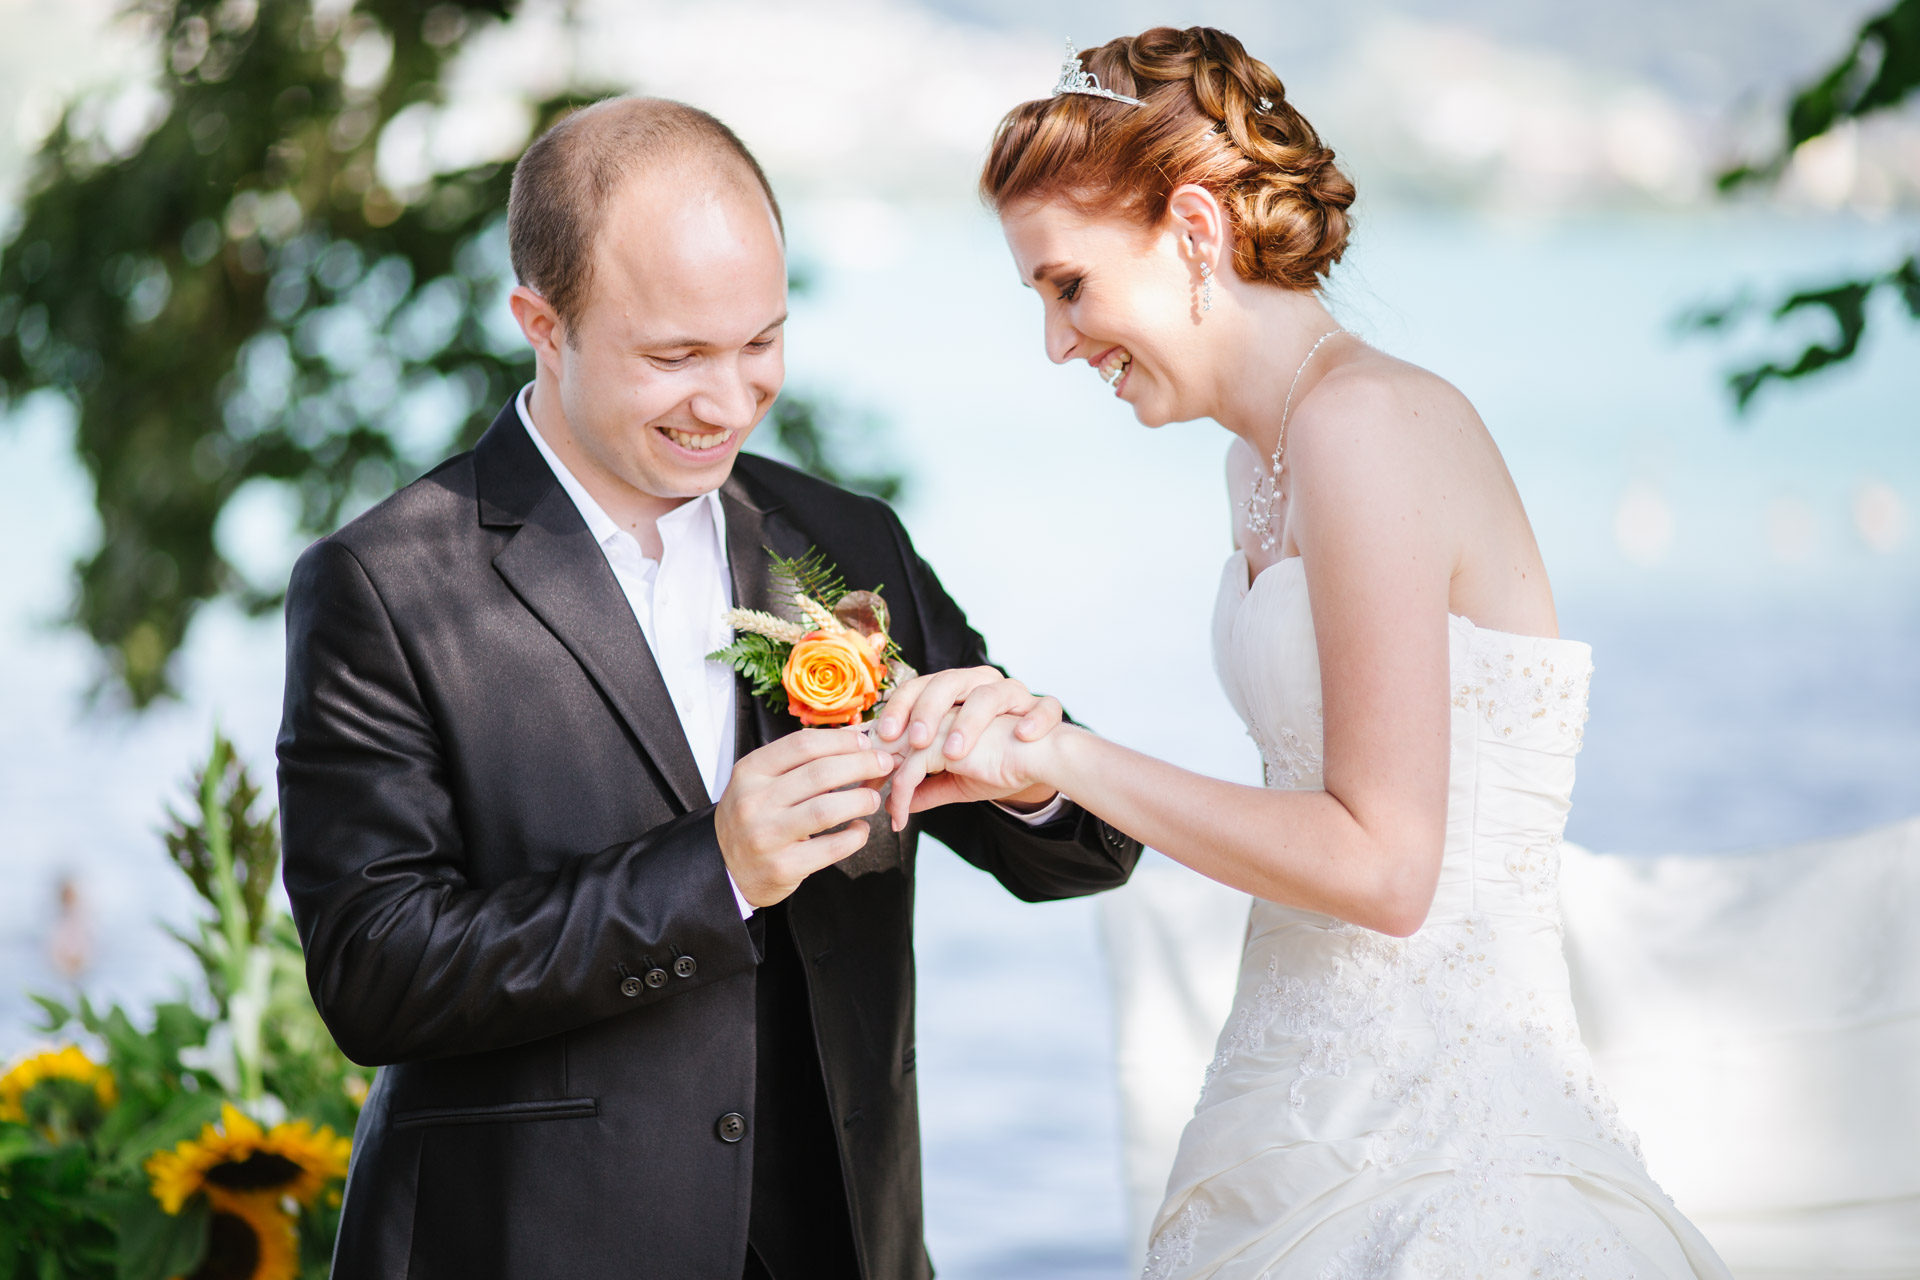 Pixelart_Hochzeitsfotografen_Loerrach_Rheinfelden_Hallwil_Schweiz_Linda-Ramon-1038